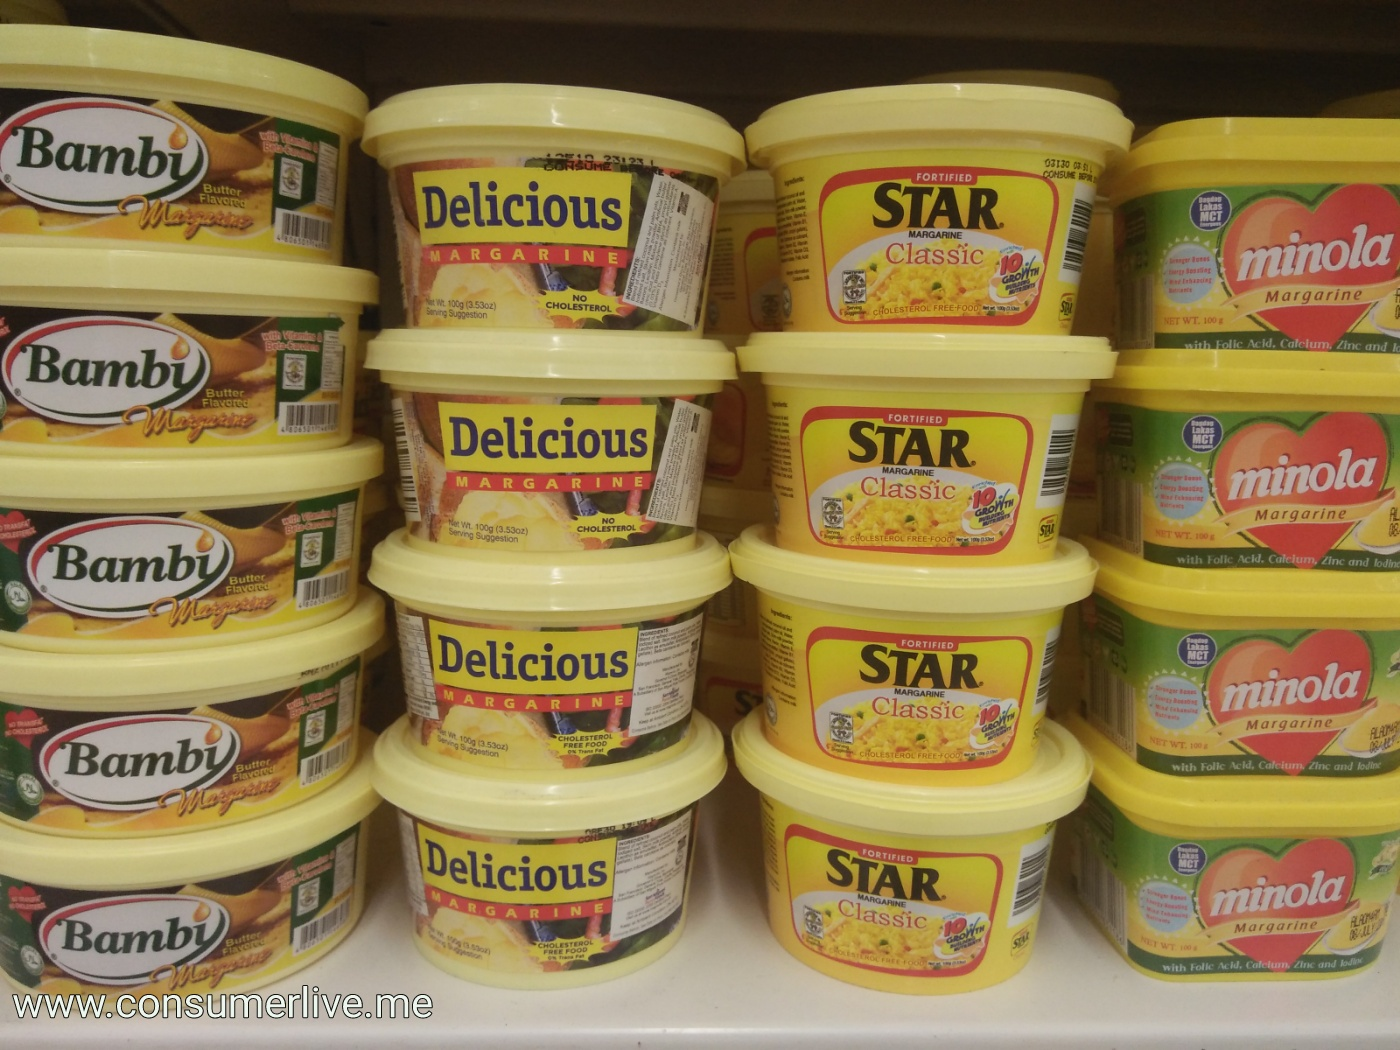 The Preferred Margarine